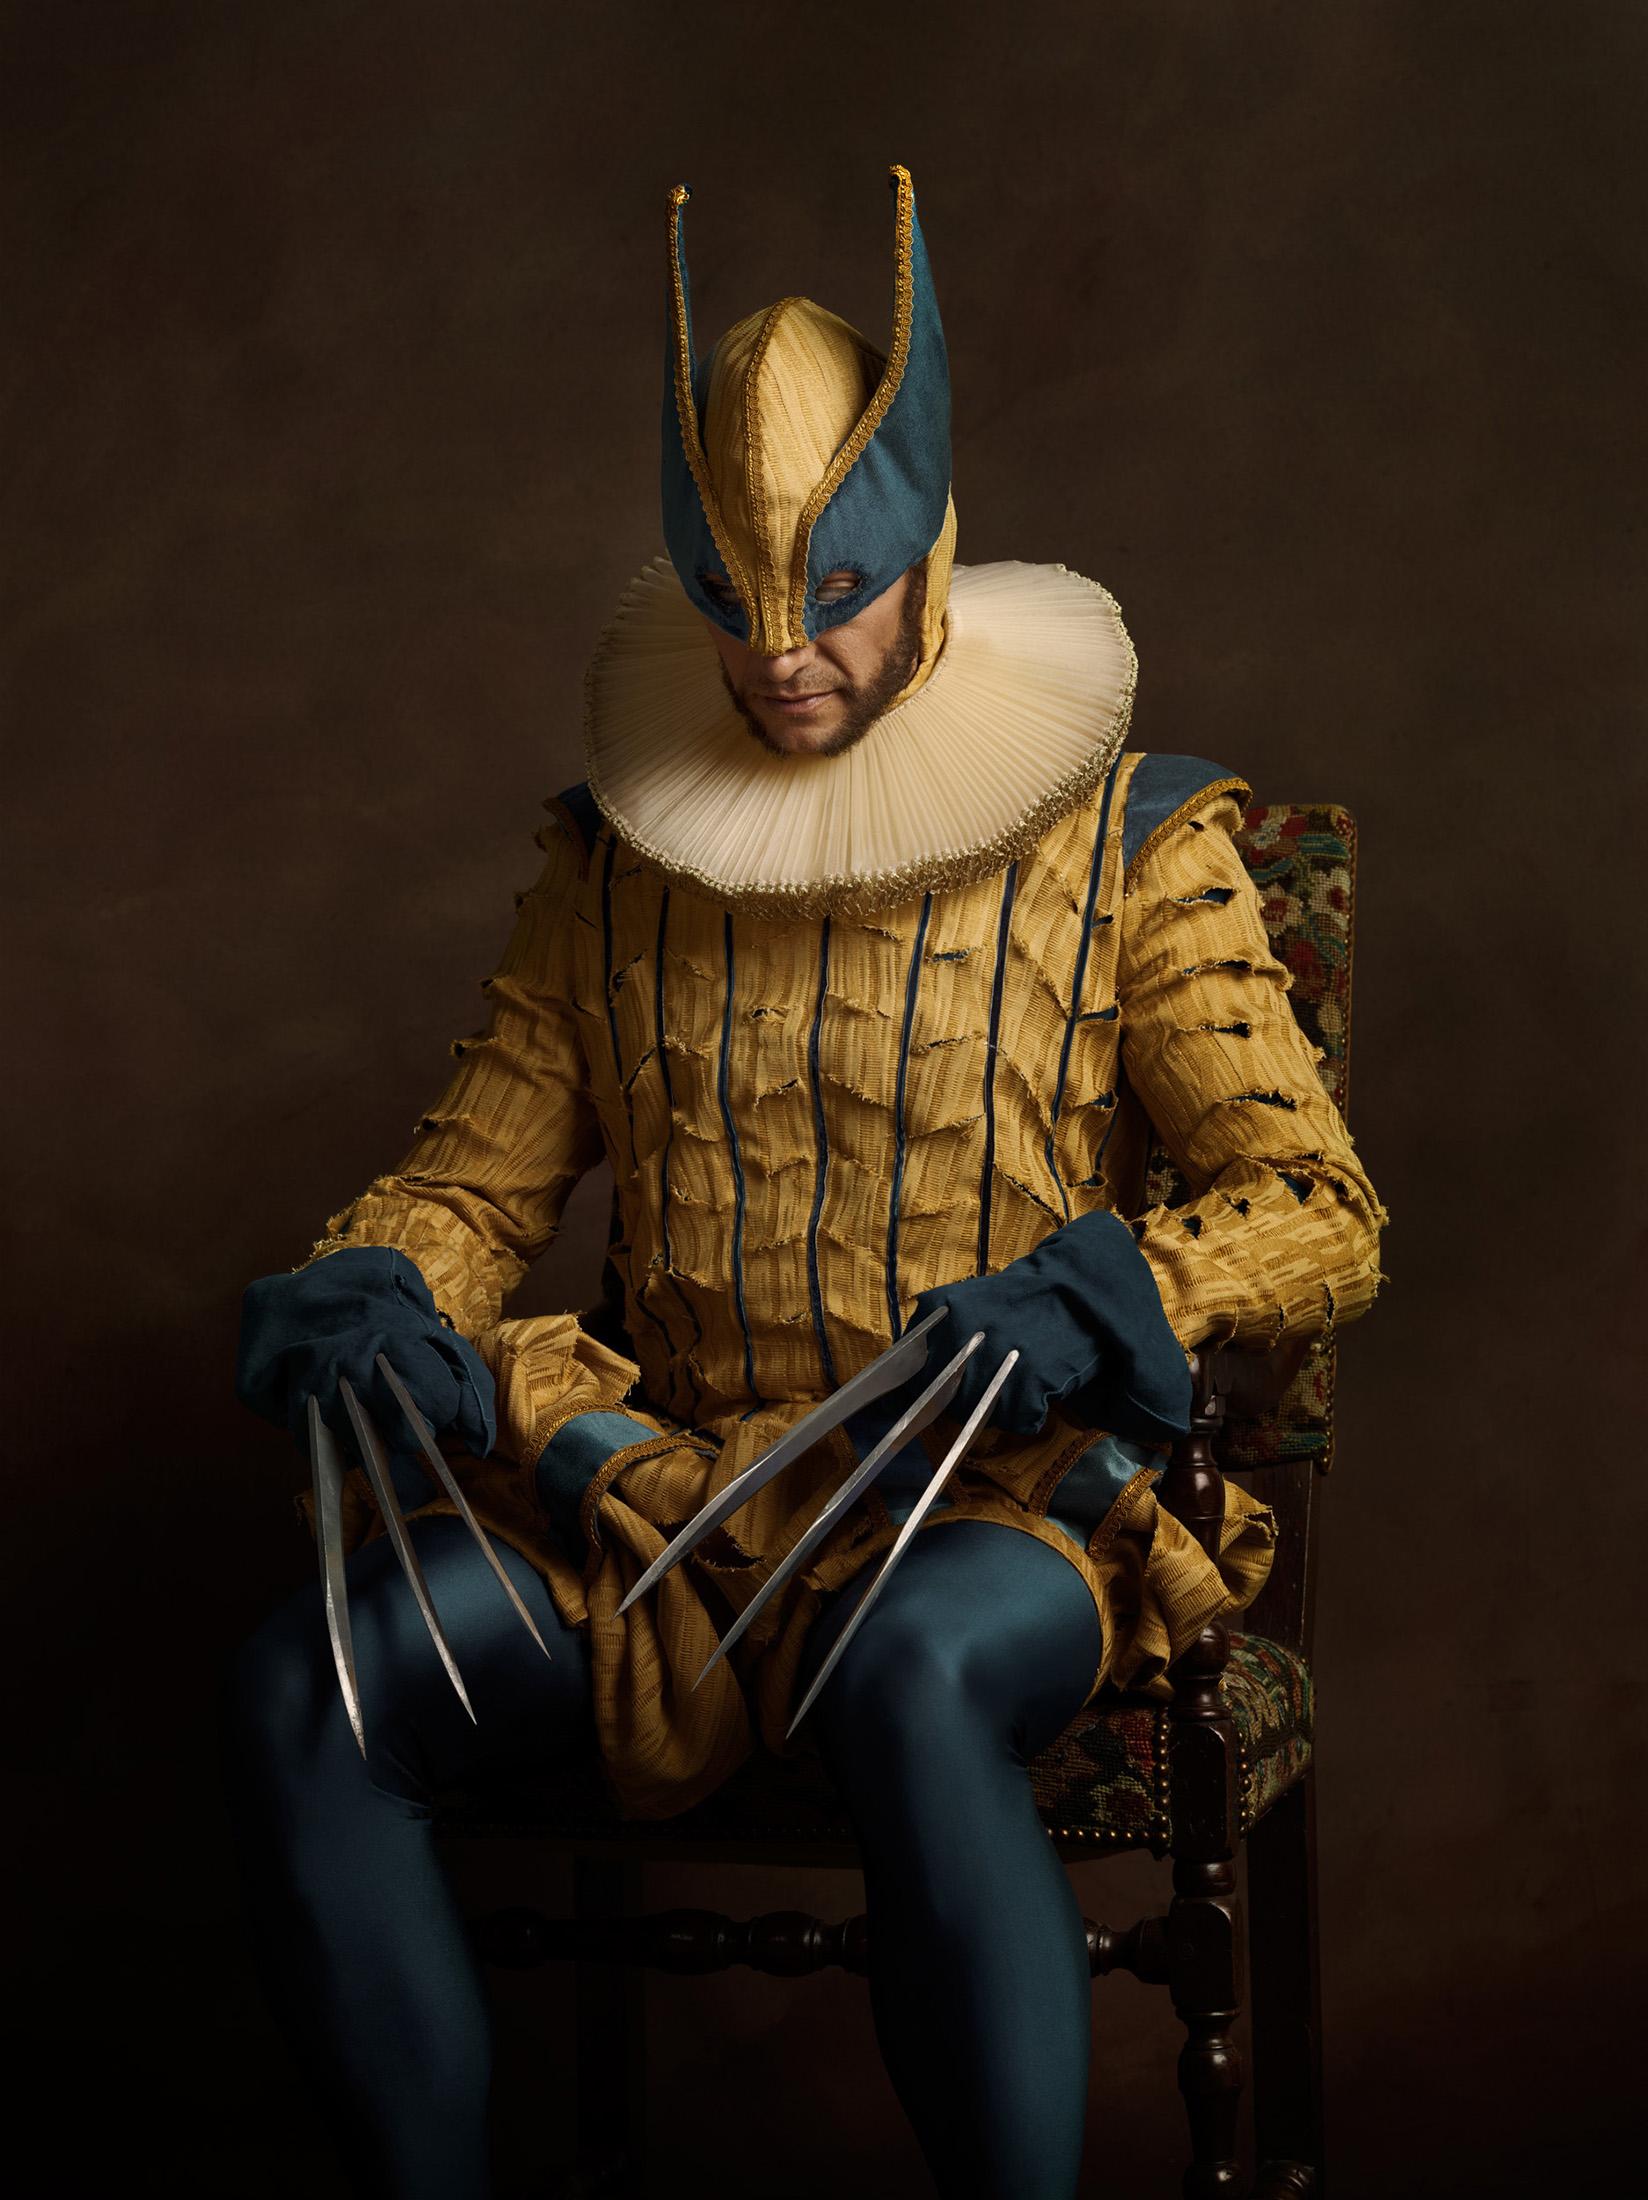 15_07_13_Super-Heros-Flamands-_04_Wolverine_0194_04